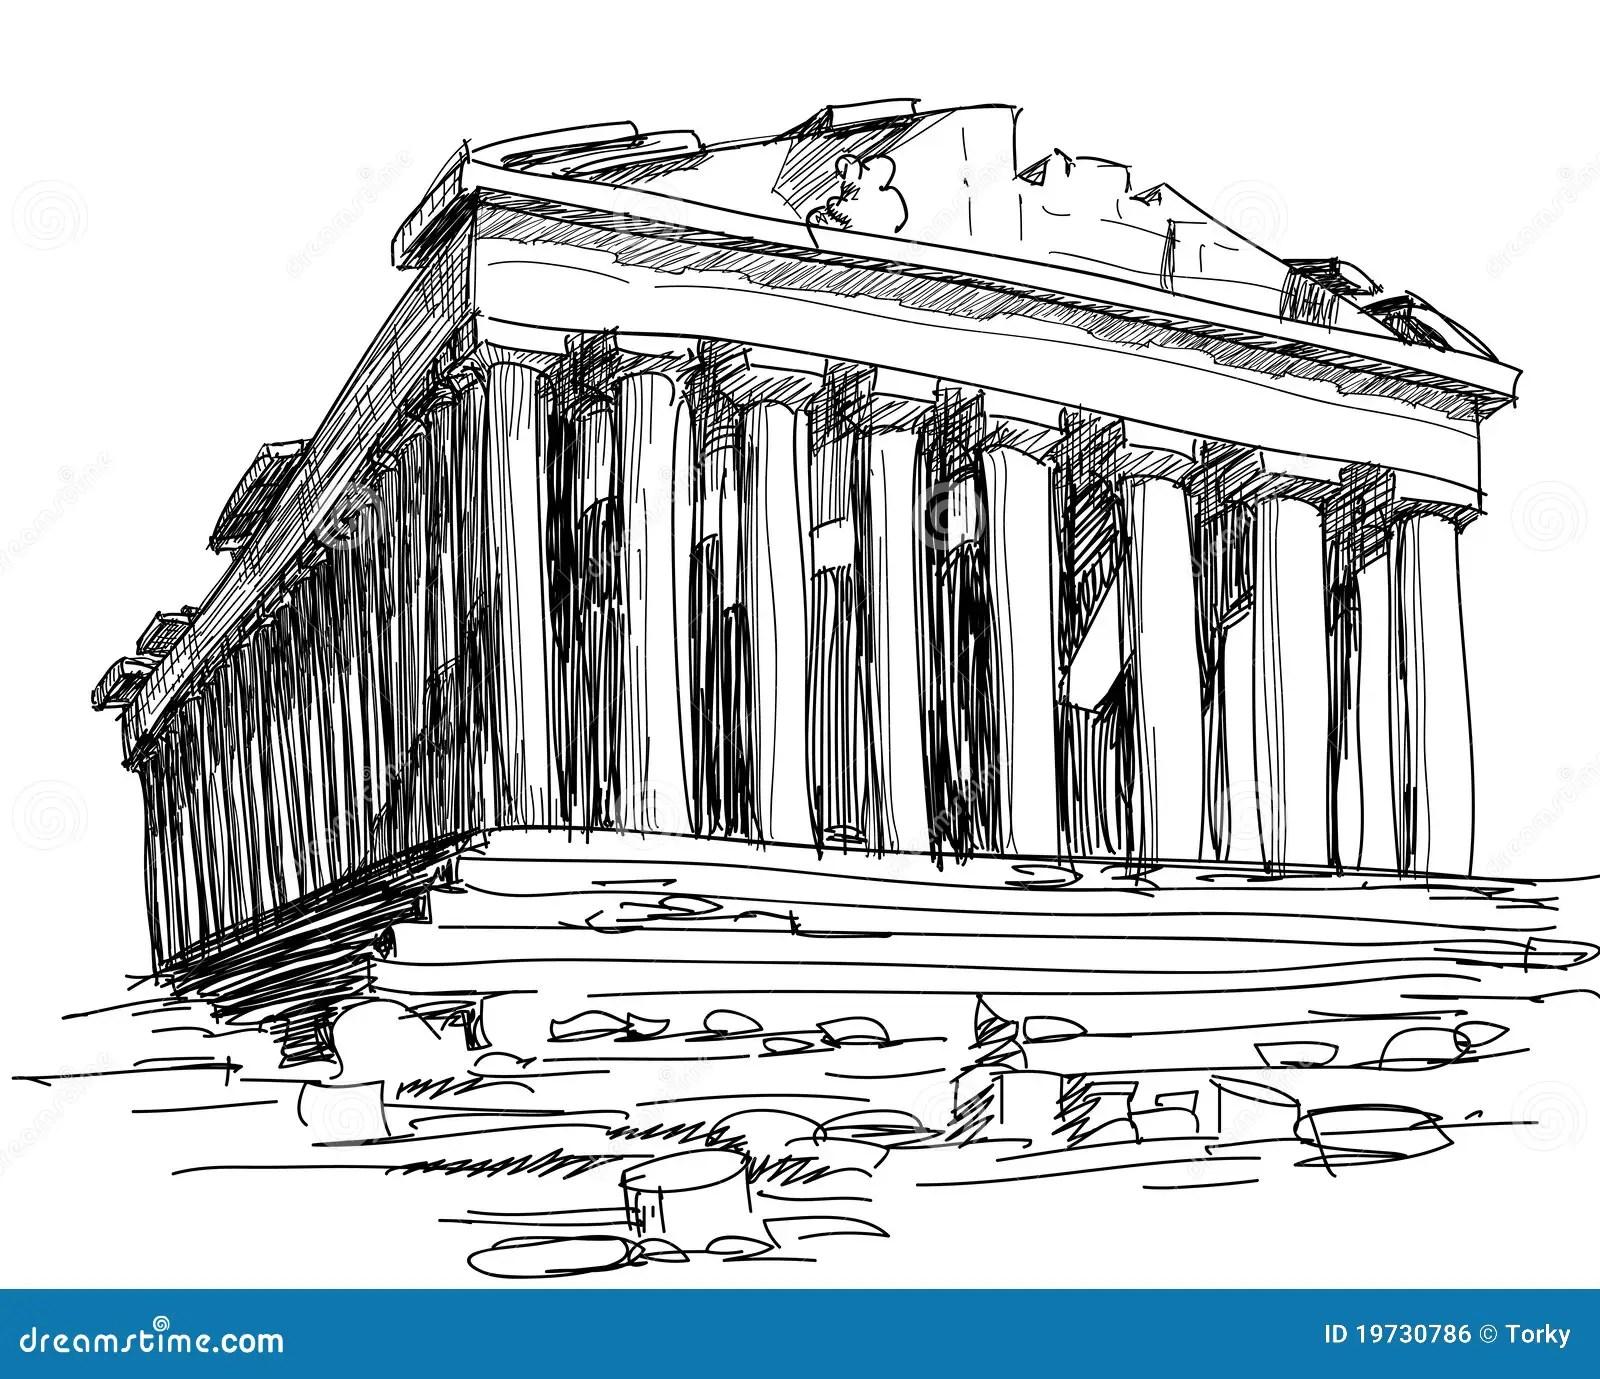 Griechenland Parthenonskizze Vektor Abbildung